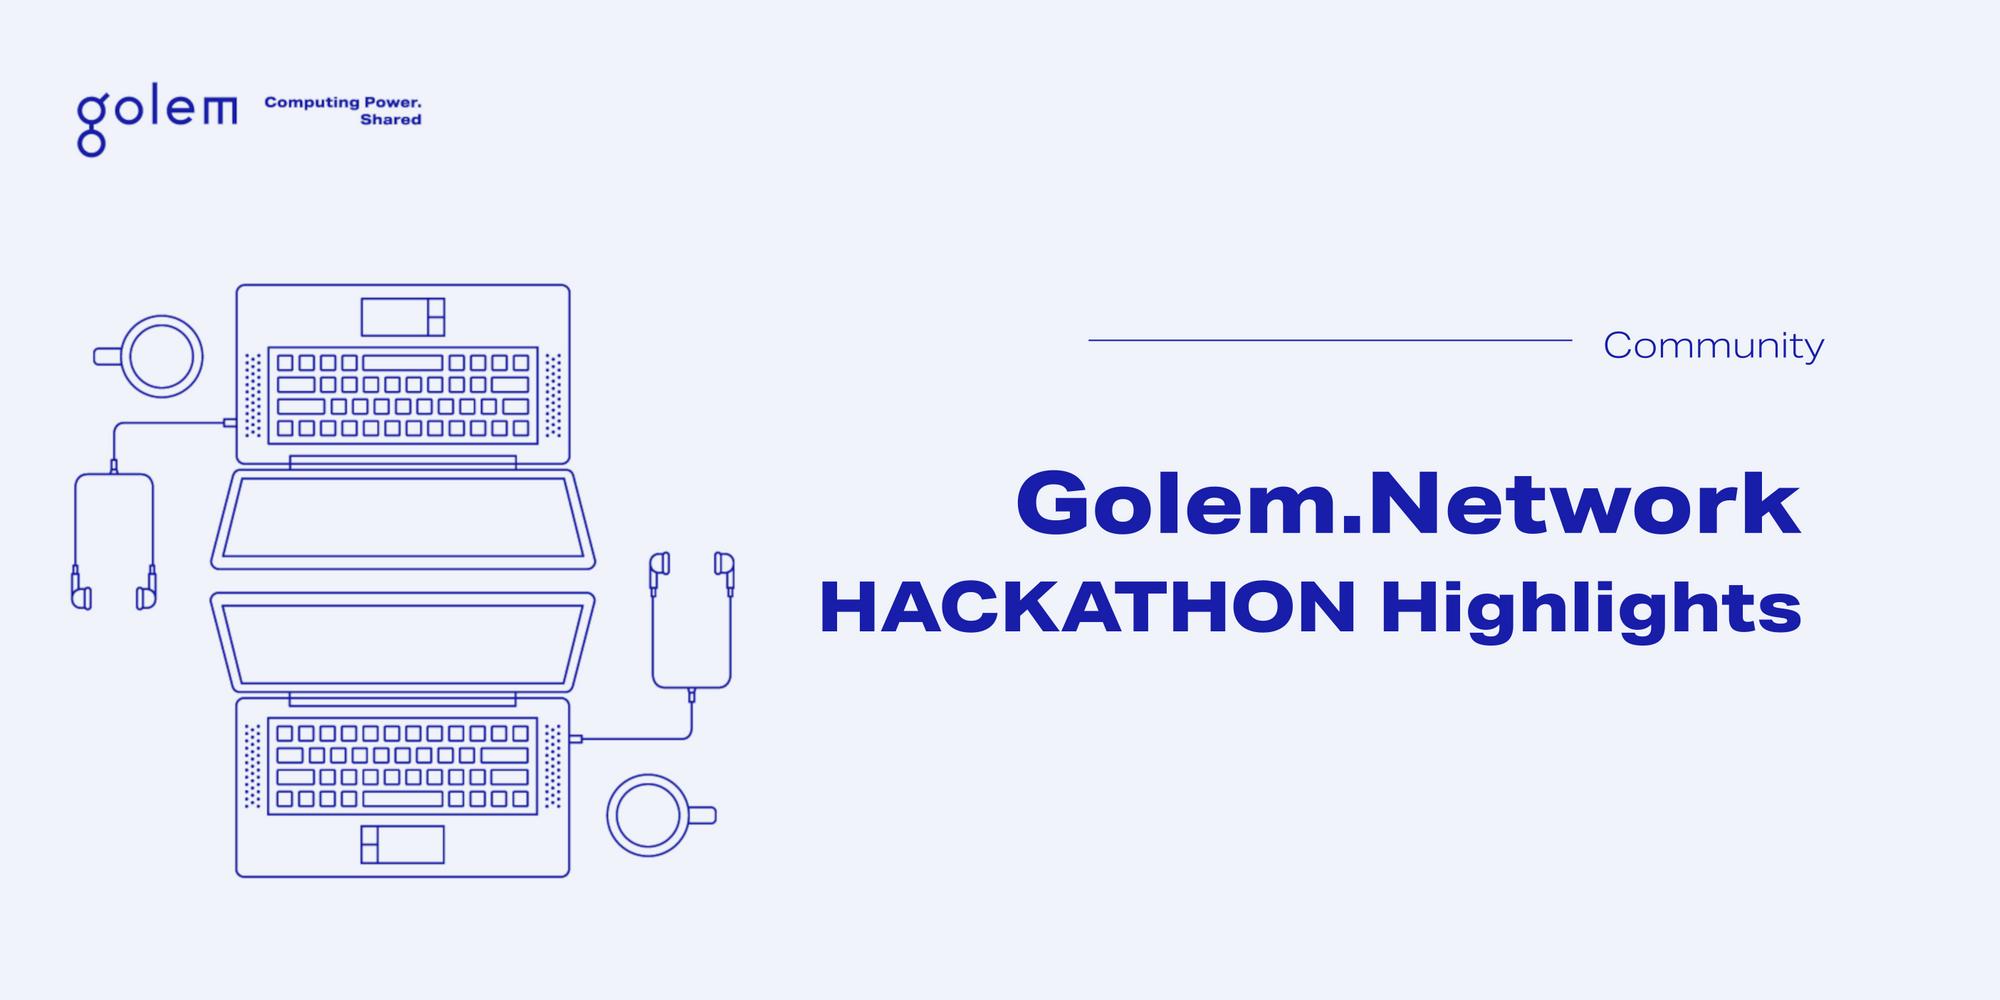 Golem Hackathon Highlights